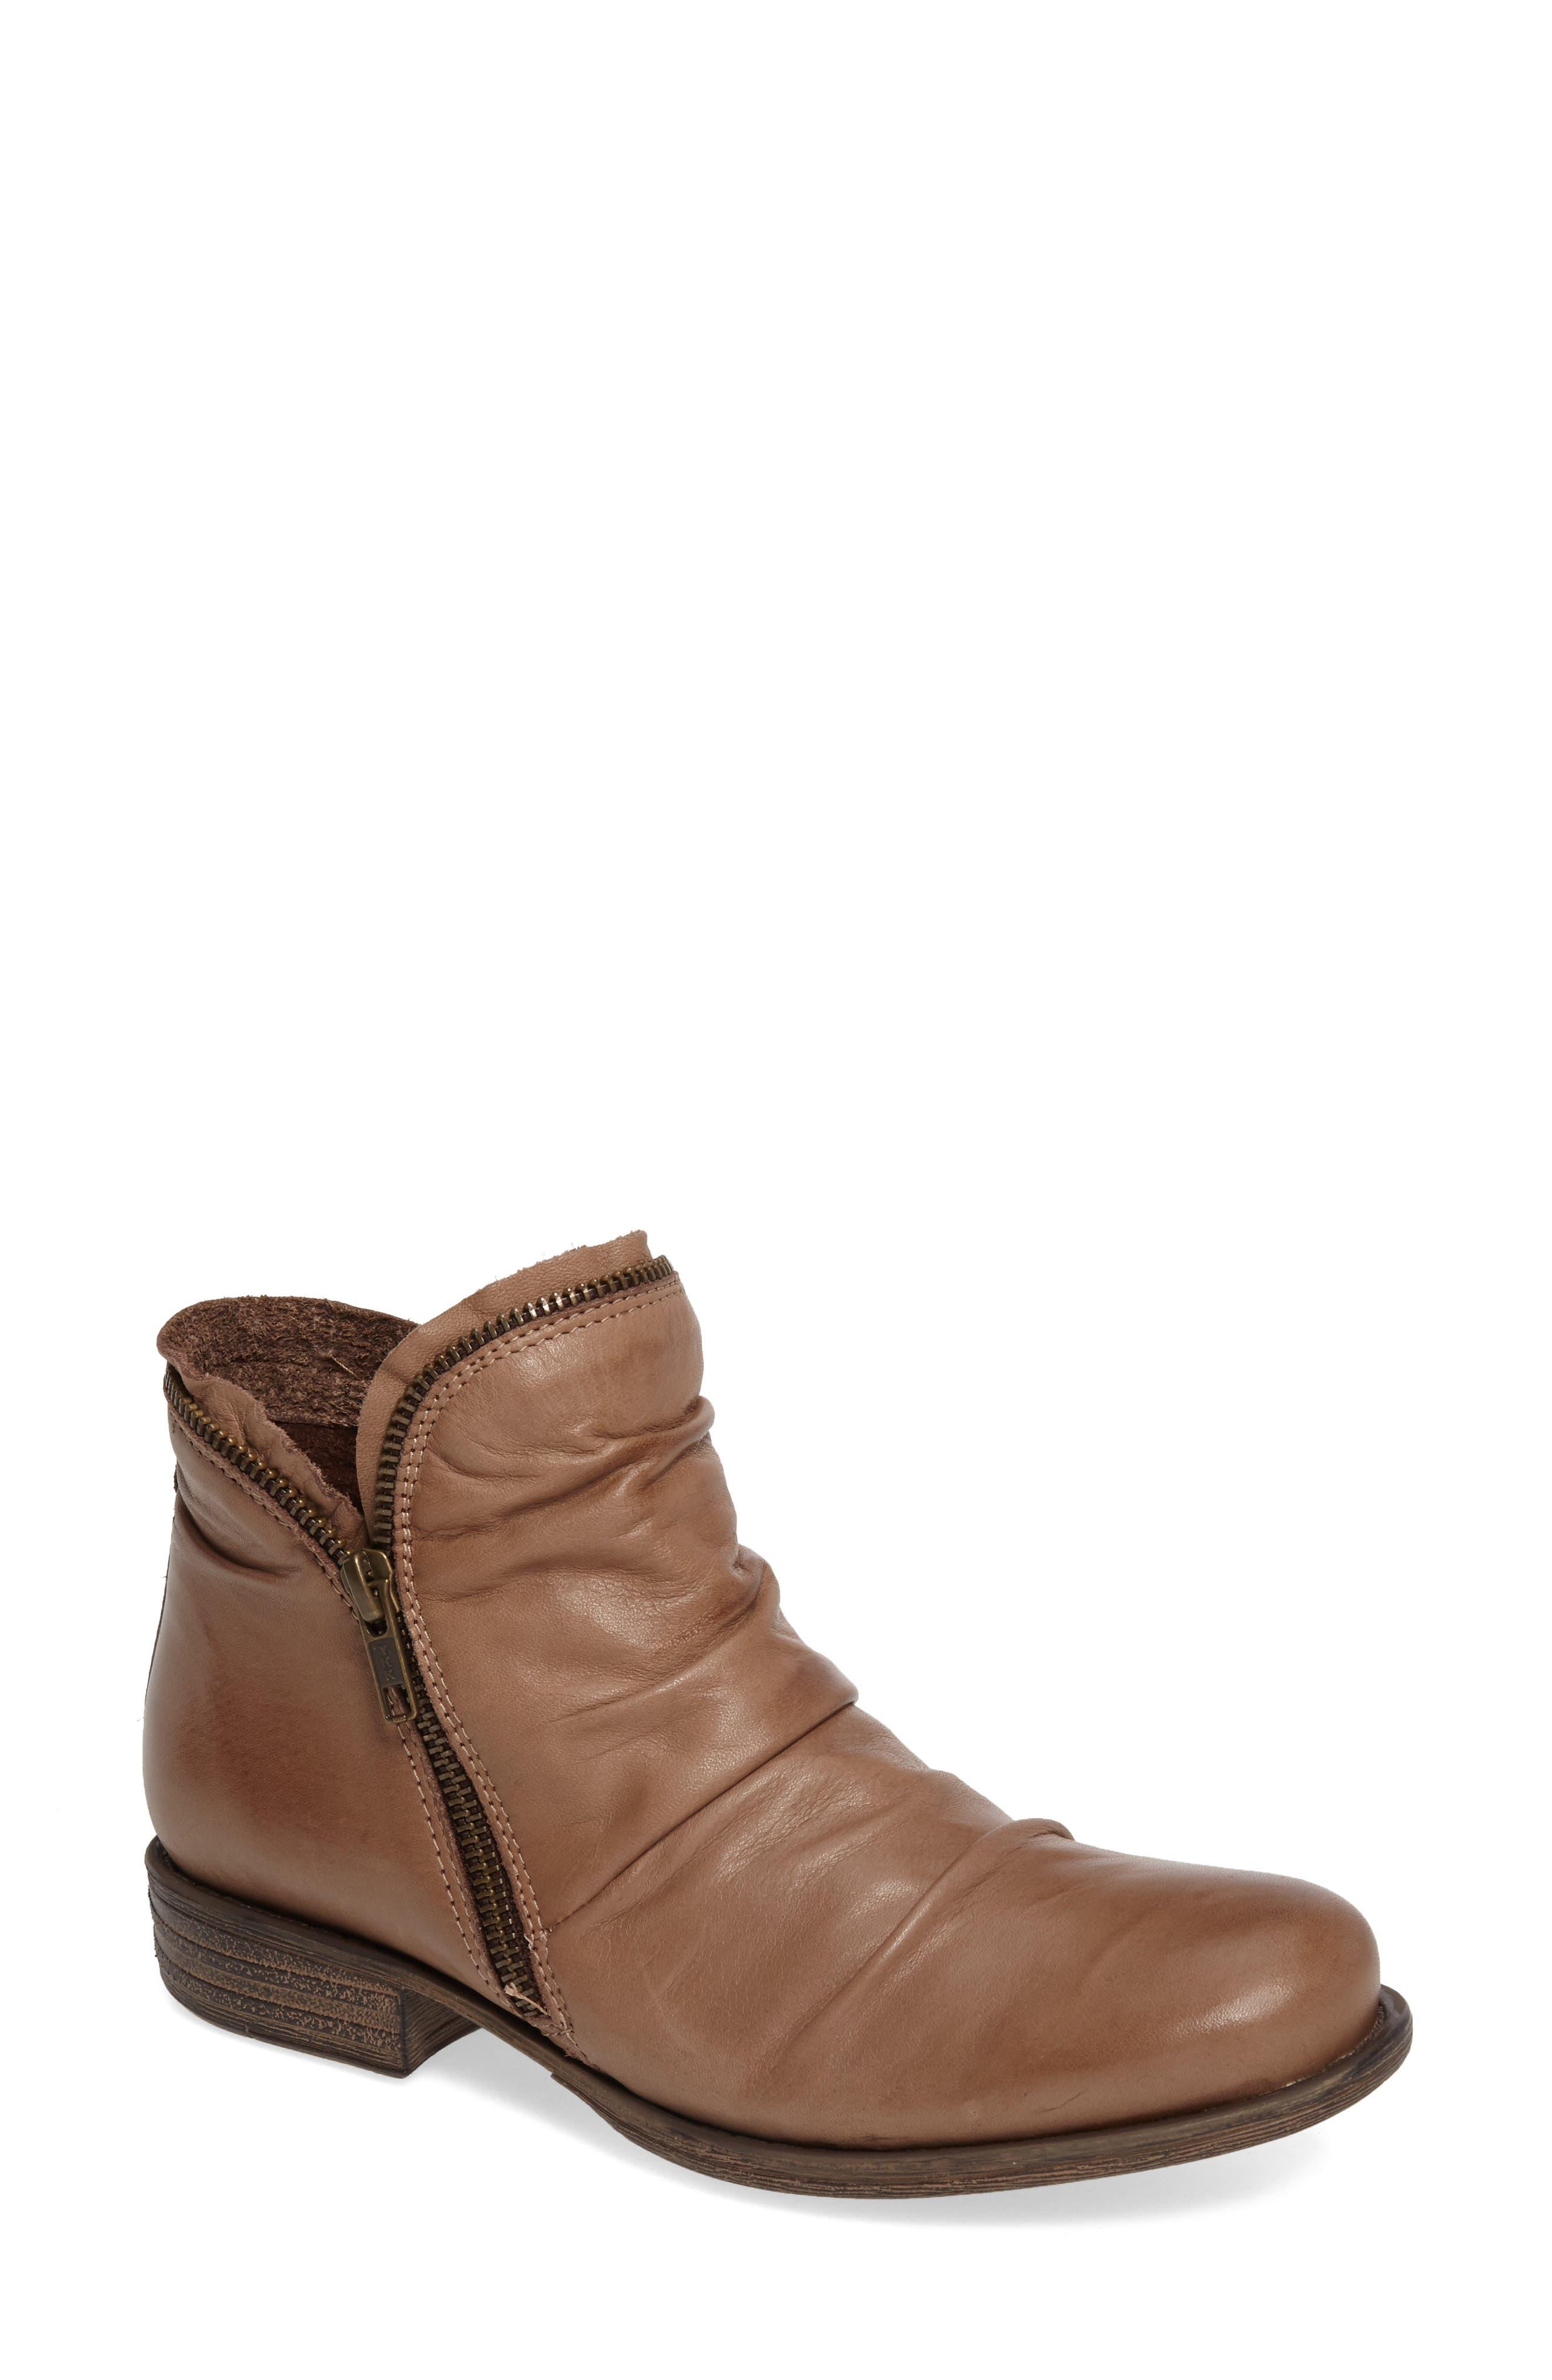 'Luna' Ankle Boot,                         Main,                         color, Beige